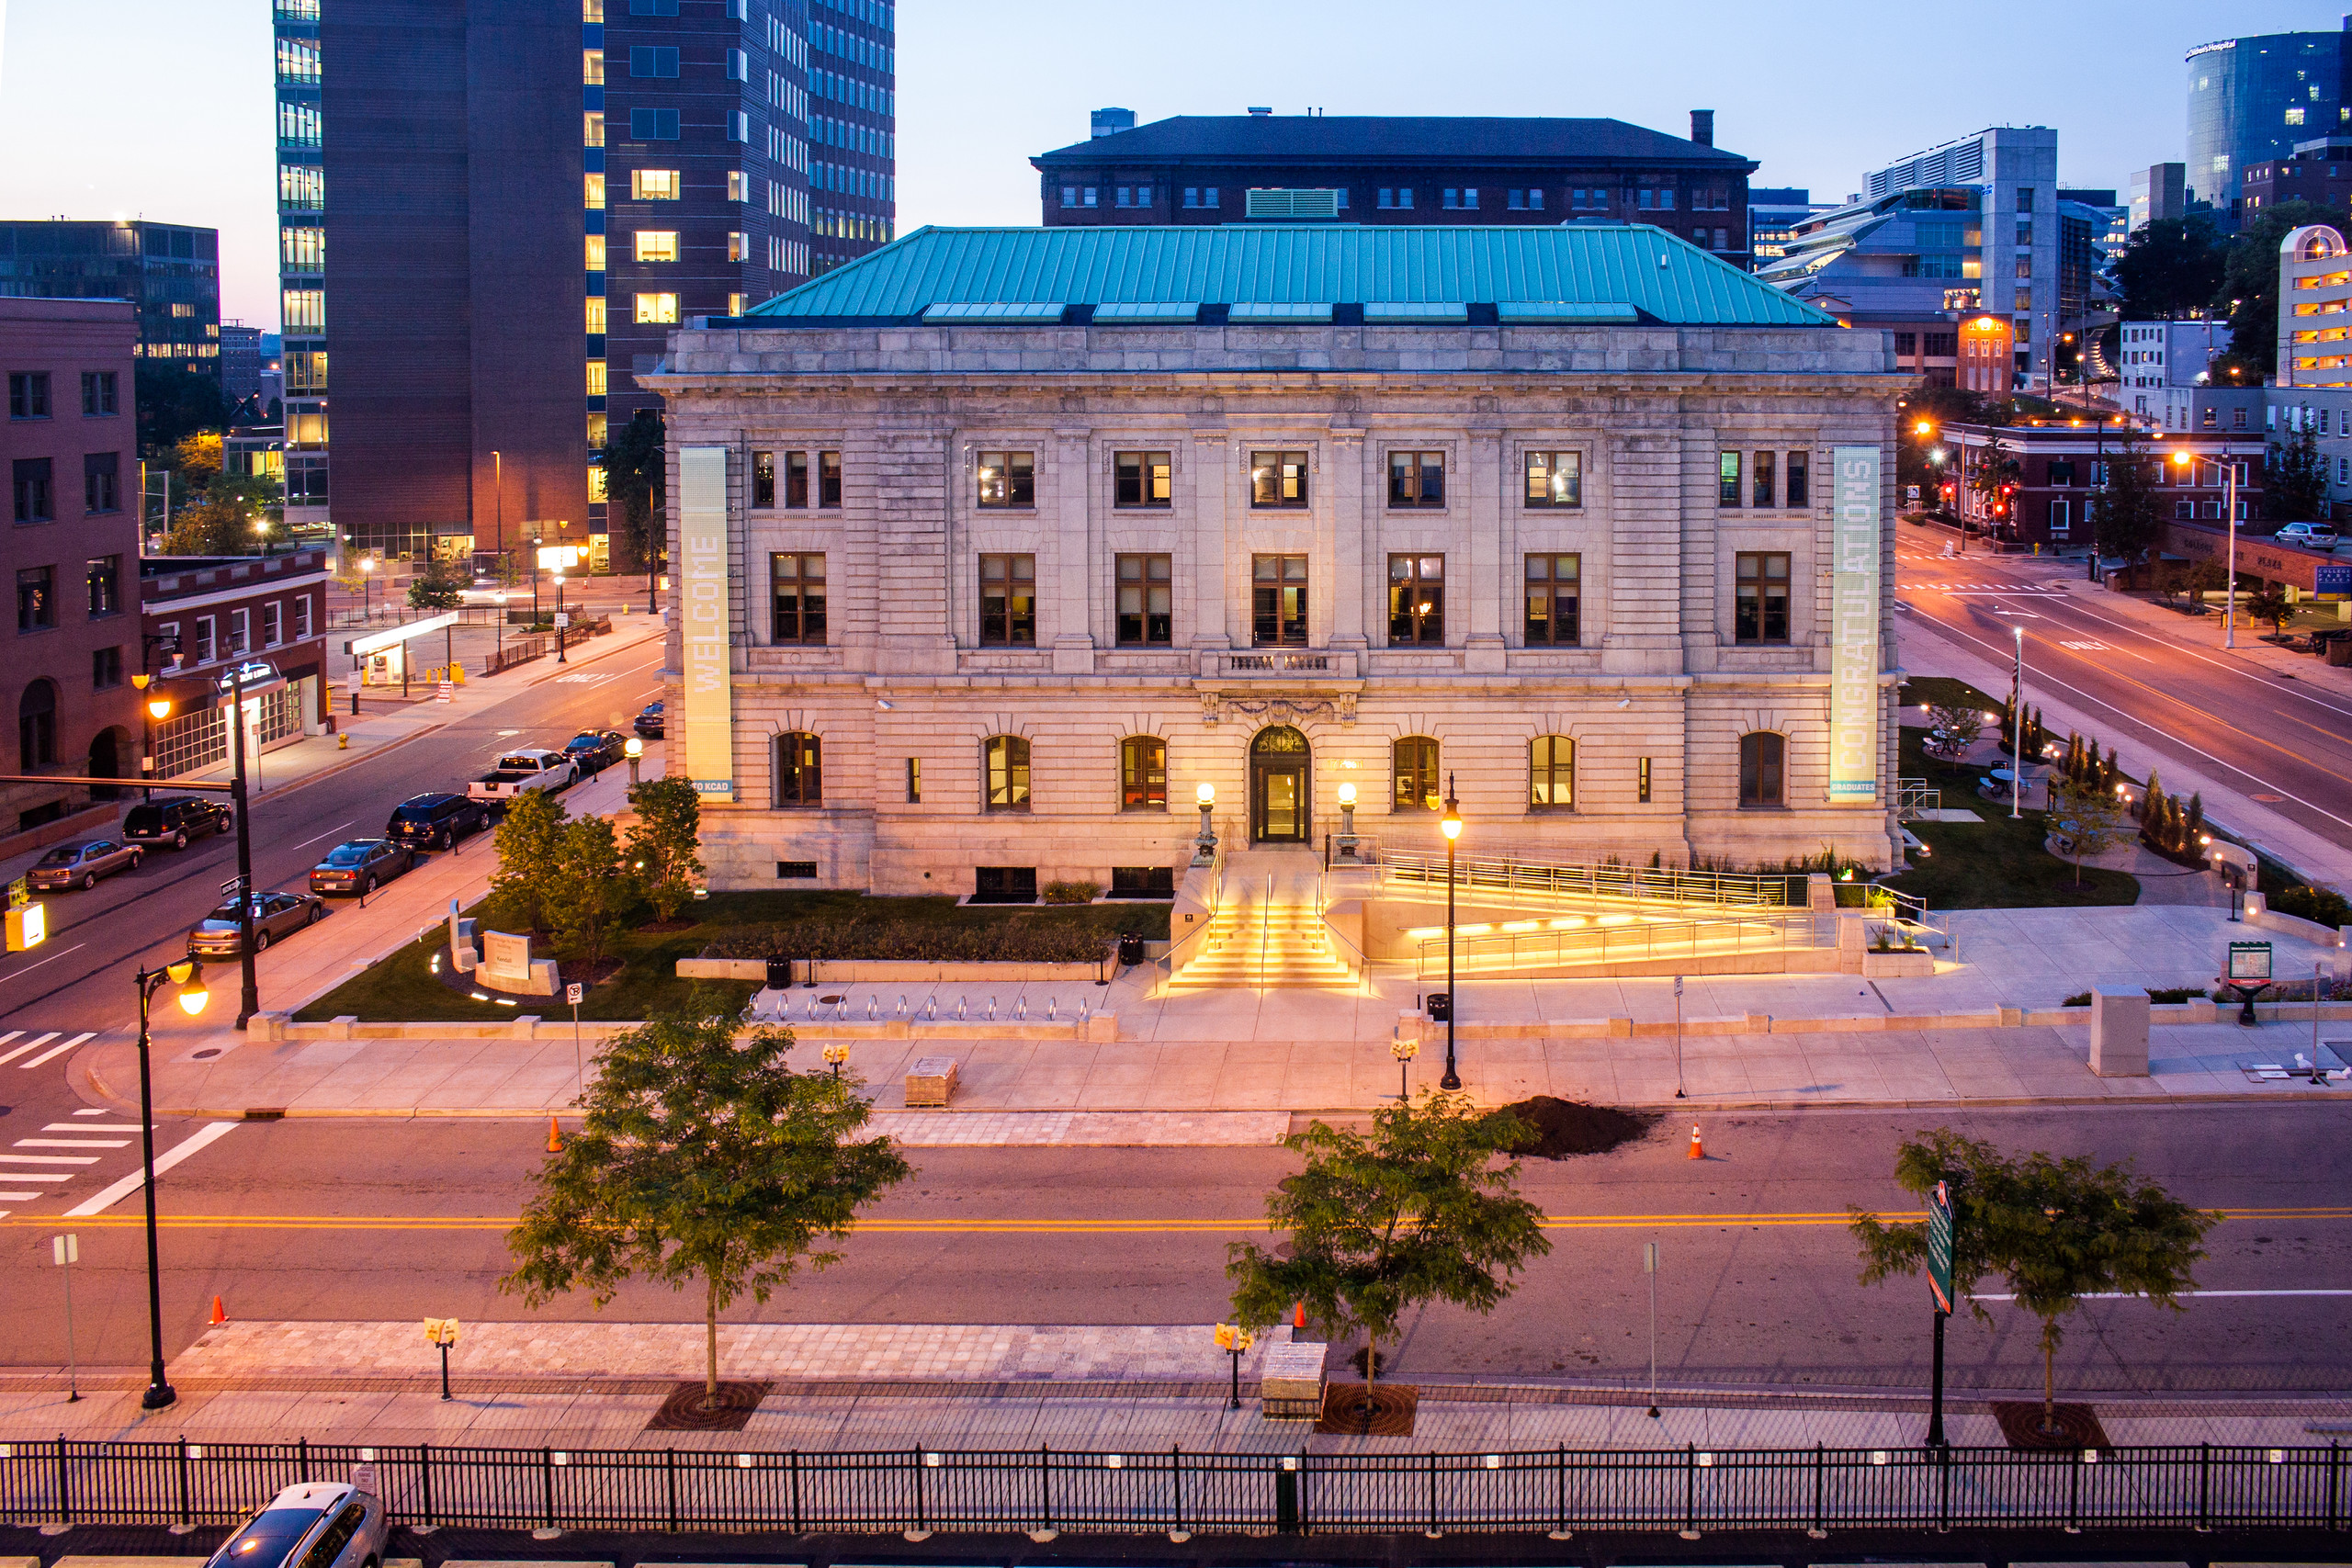 University Of Michigan Art And Design